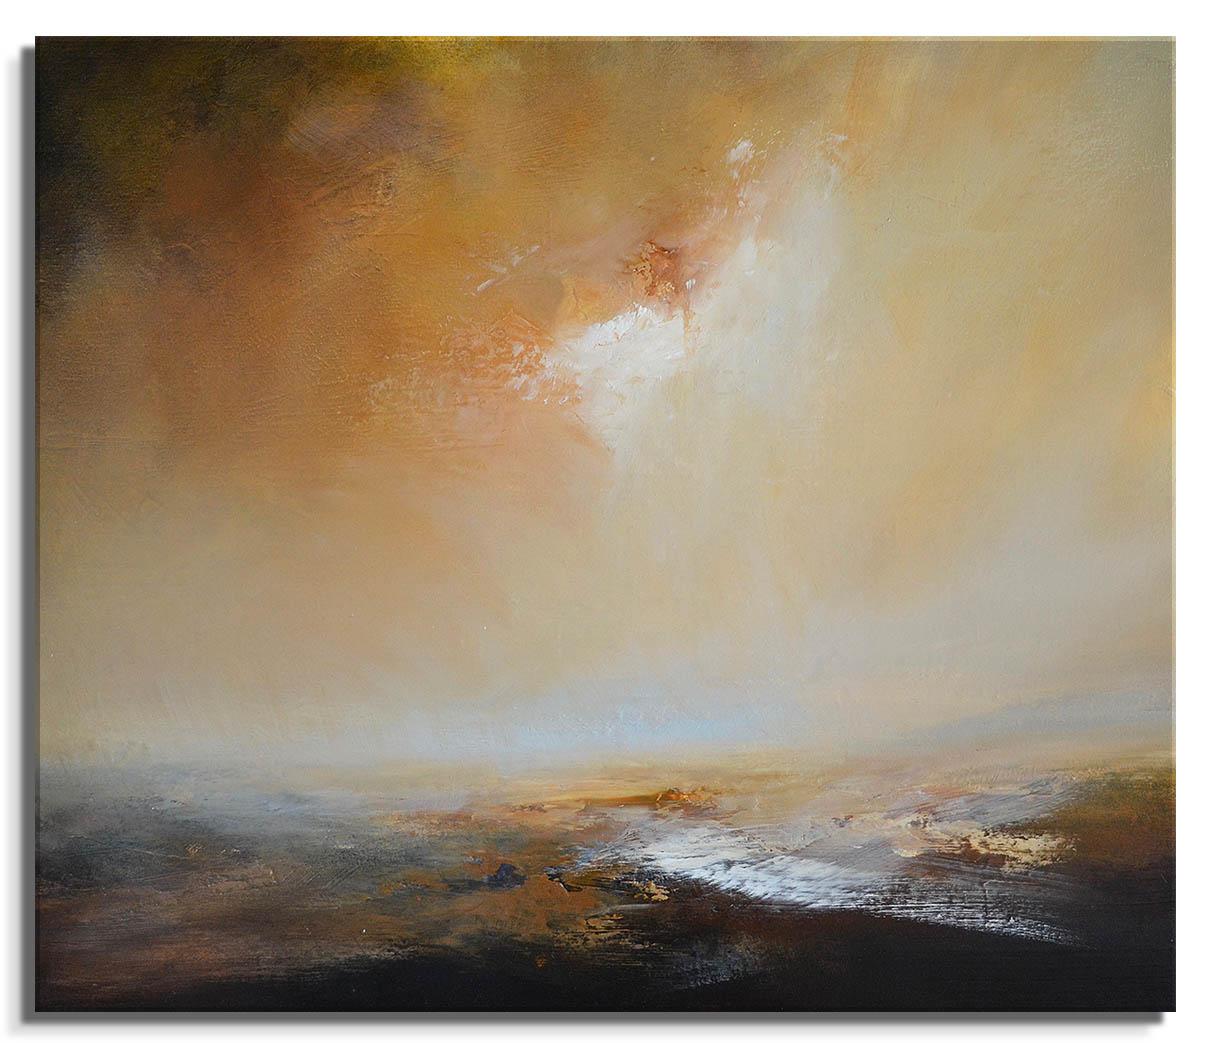 Drifting East by David Taylor